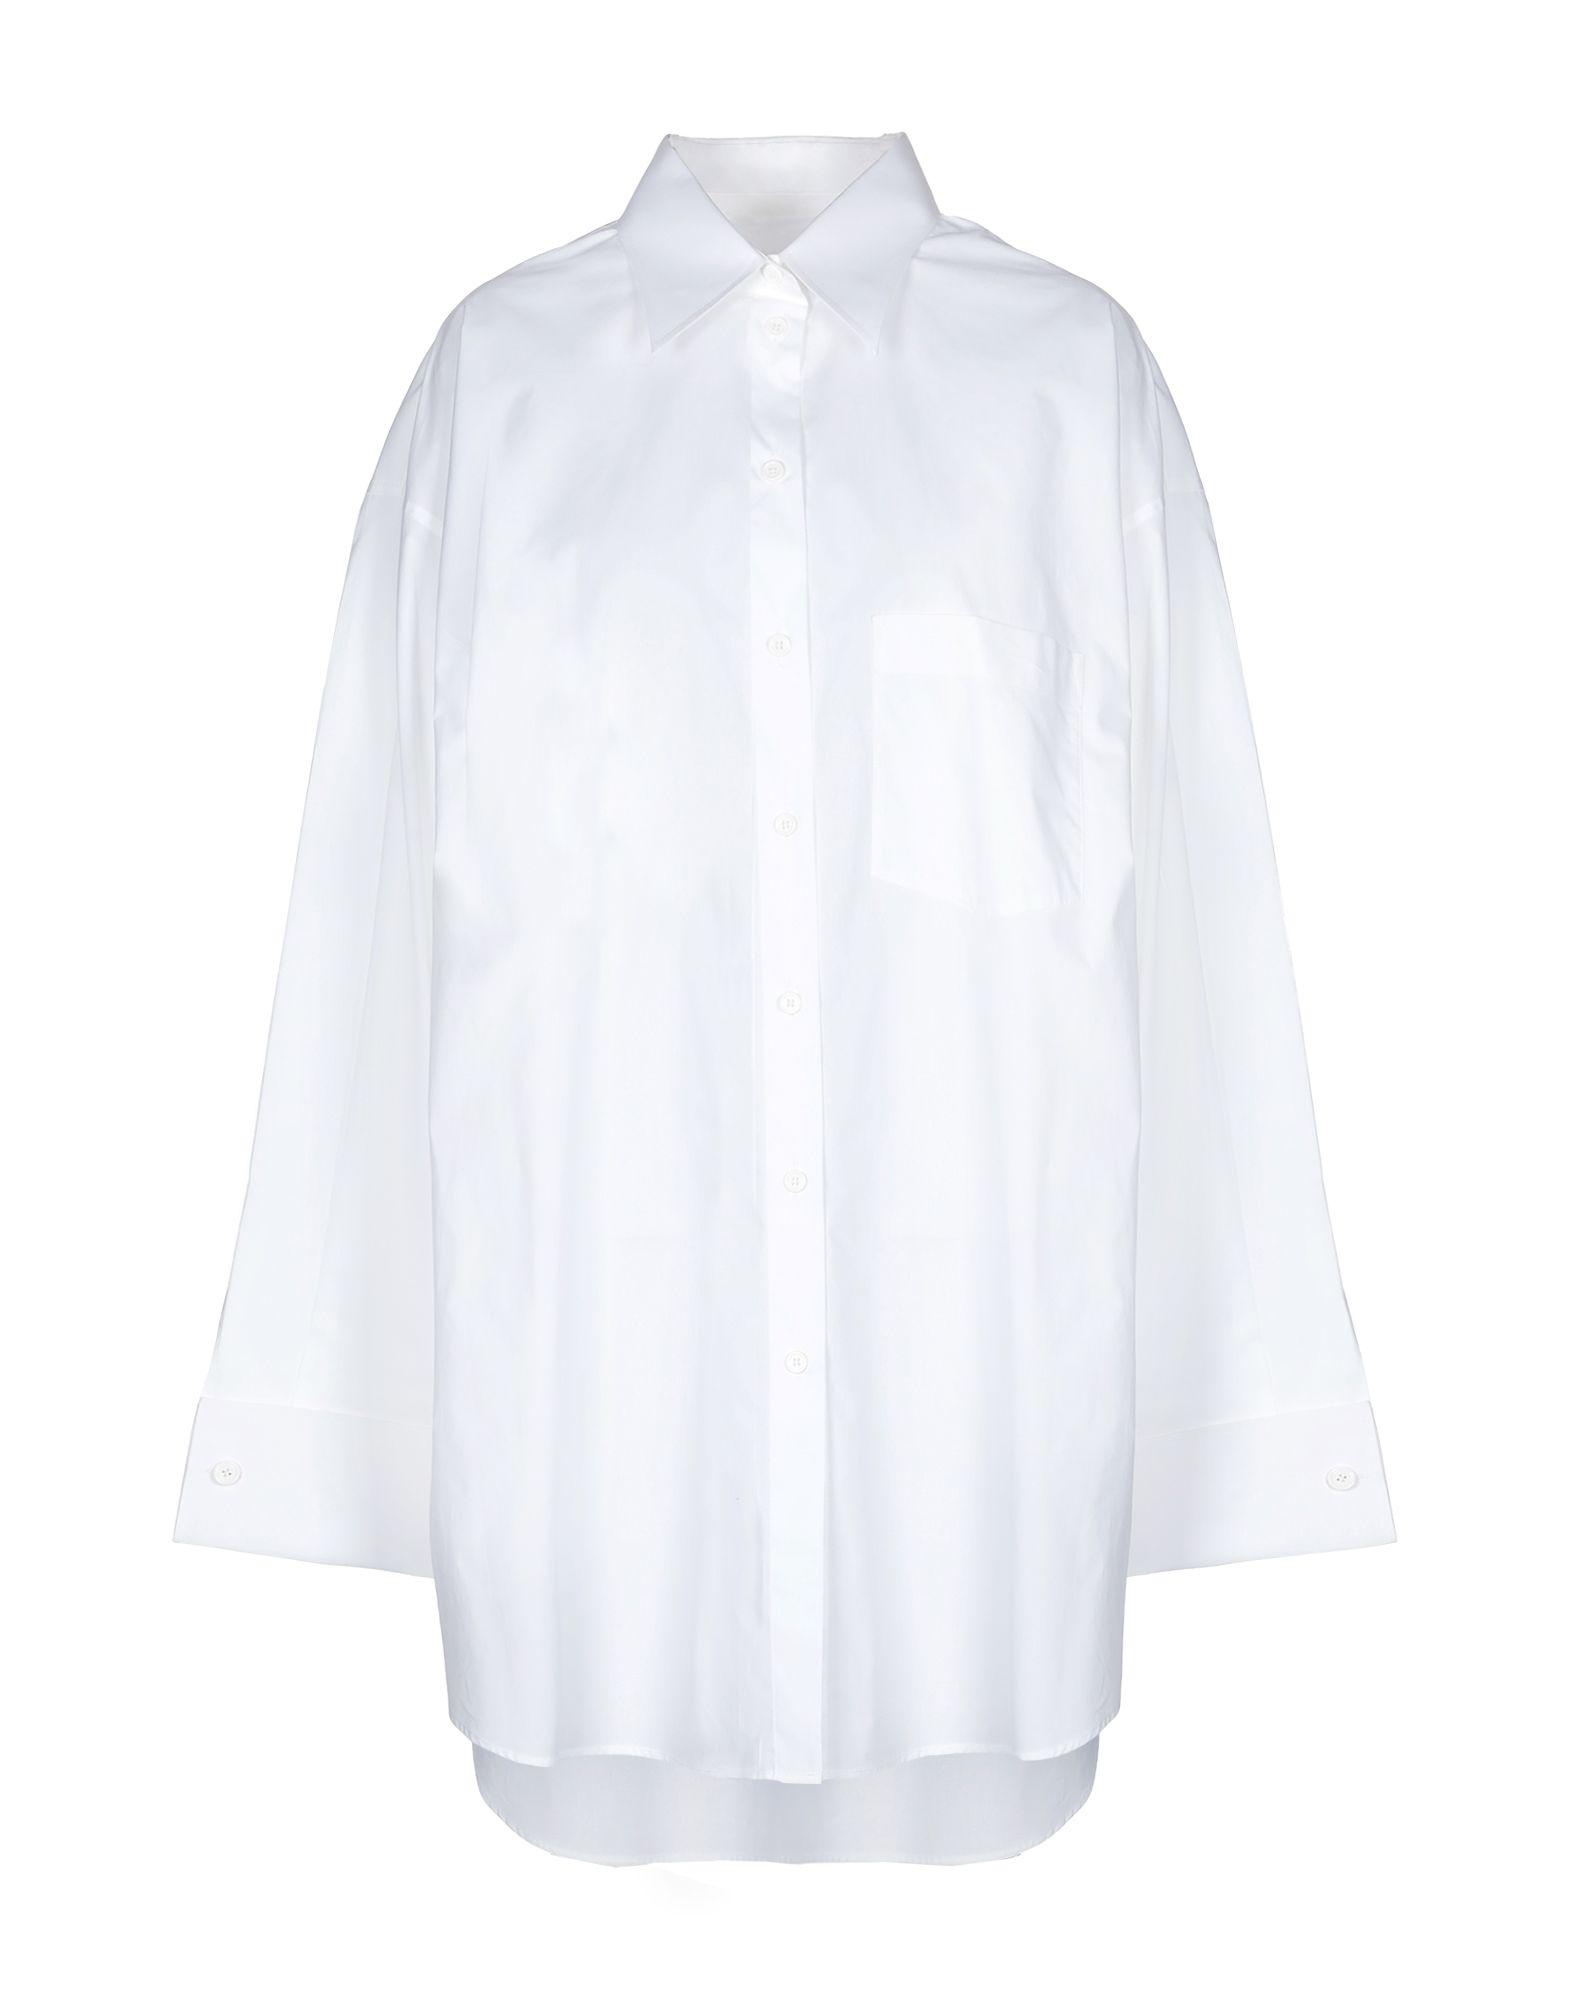 MM6 MAISON MARGIELA 셔츠 - Item 38817603